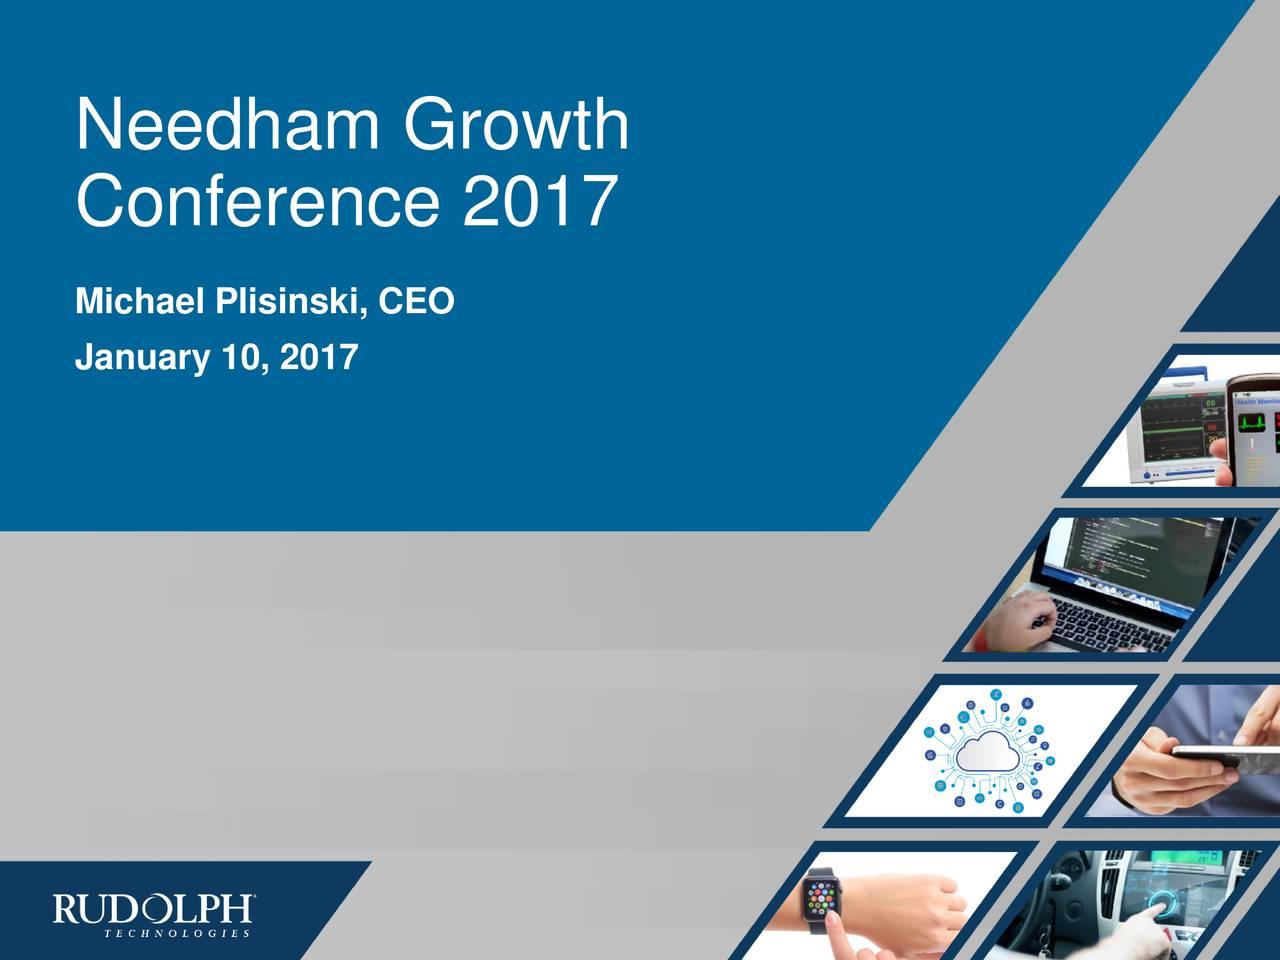 Conference 2017 Michael Plisinski, CEO January 10, 2017